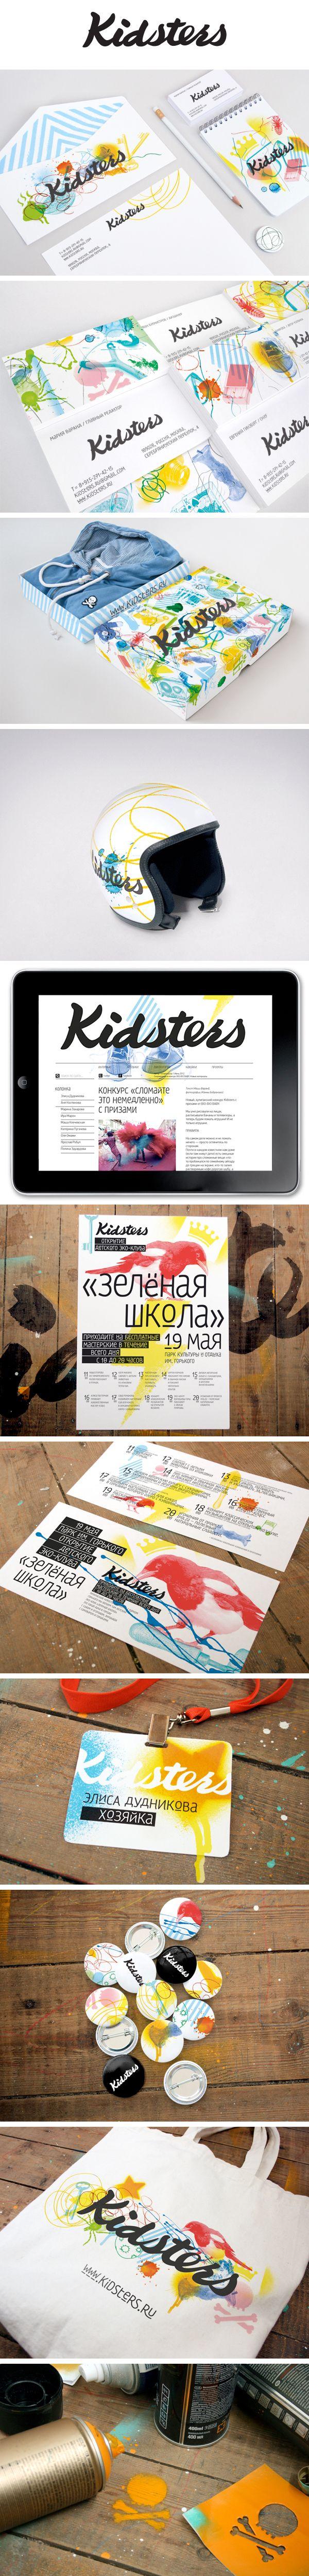 Kidsters, Identity © Иван Бурмистров #design #corporate #identity #branding #visual